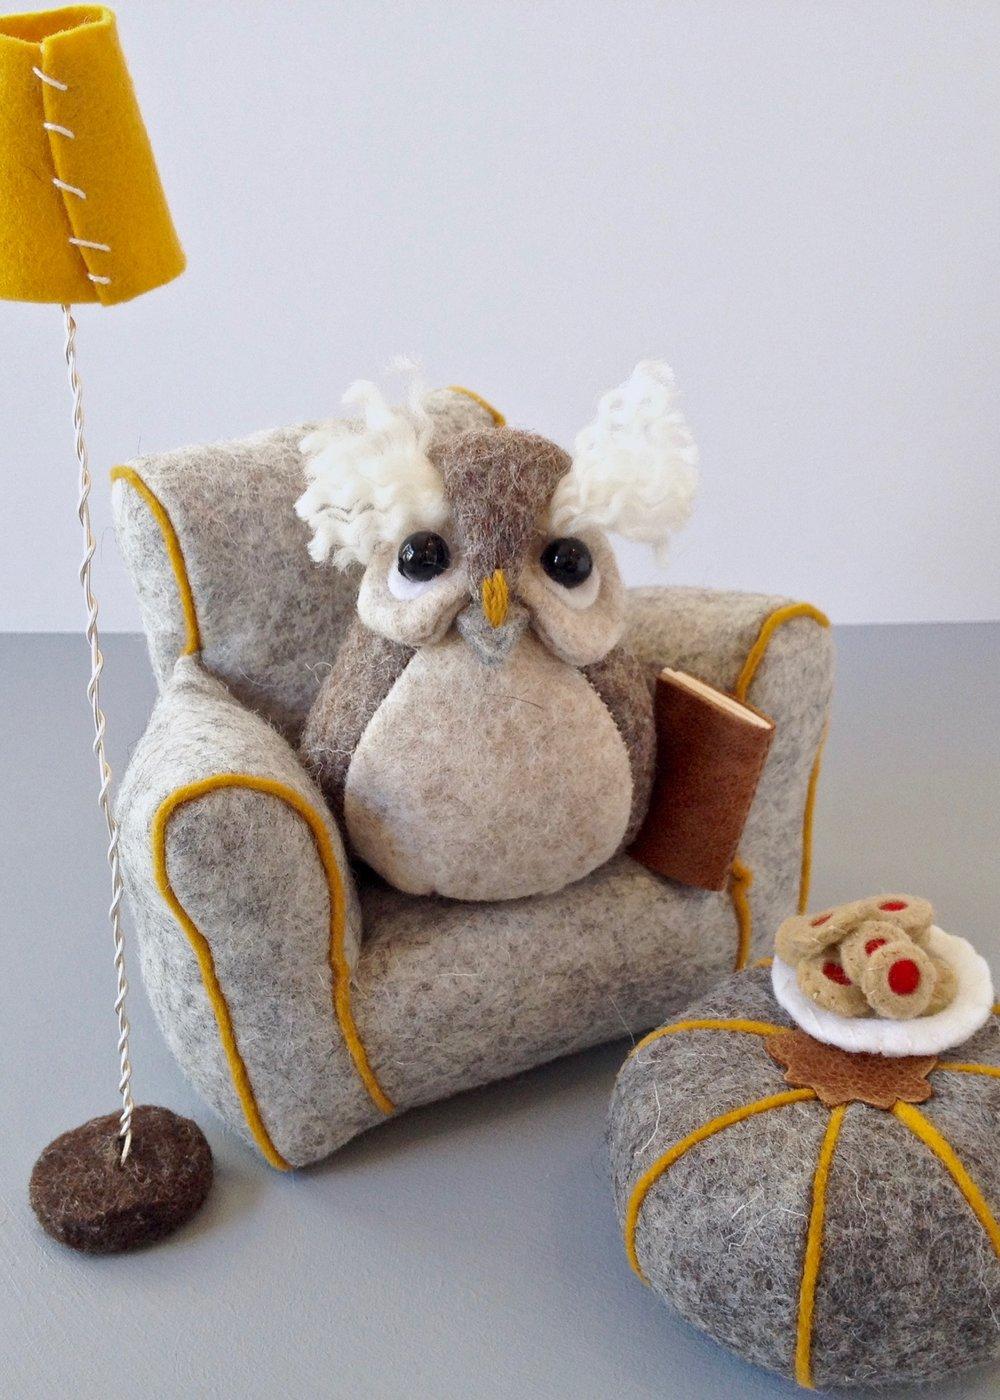 Bilberry Woods character Ollie the Owl soft sculpture wool felt figurine by Laura Mirjami